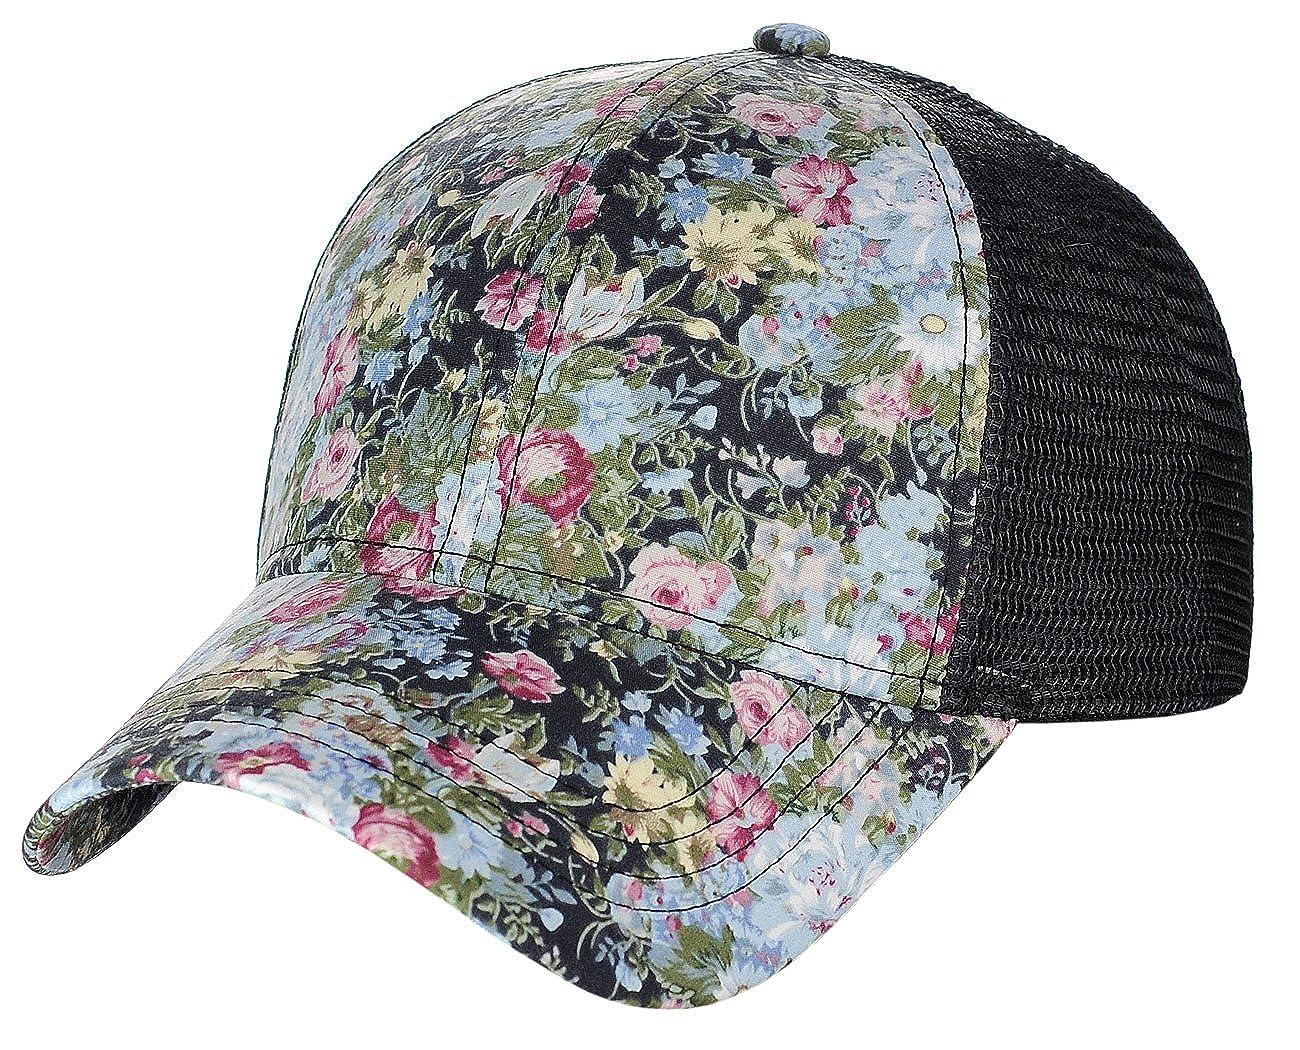 C& C Women's Floral Pattern Adjustable Mesh Trucker Baseball Cap Hat Rose Navy C.C BA733-NV